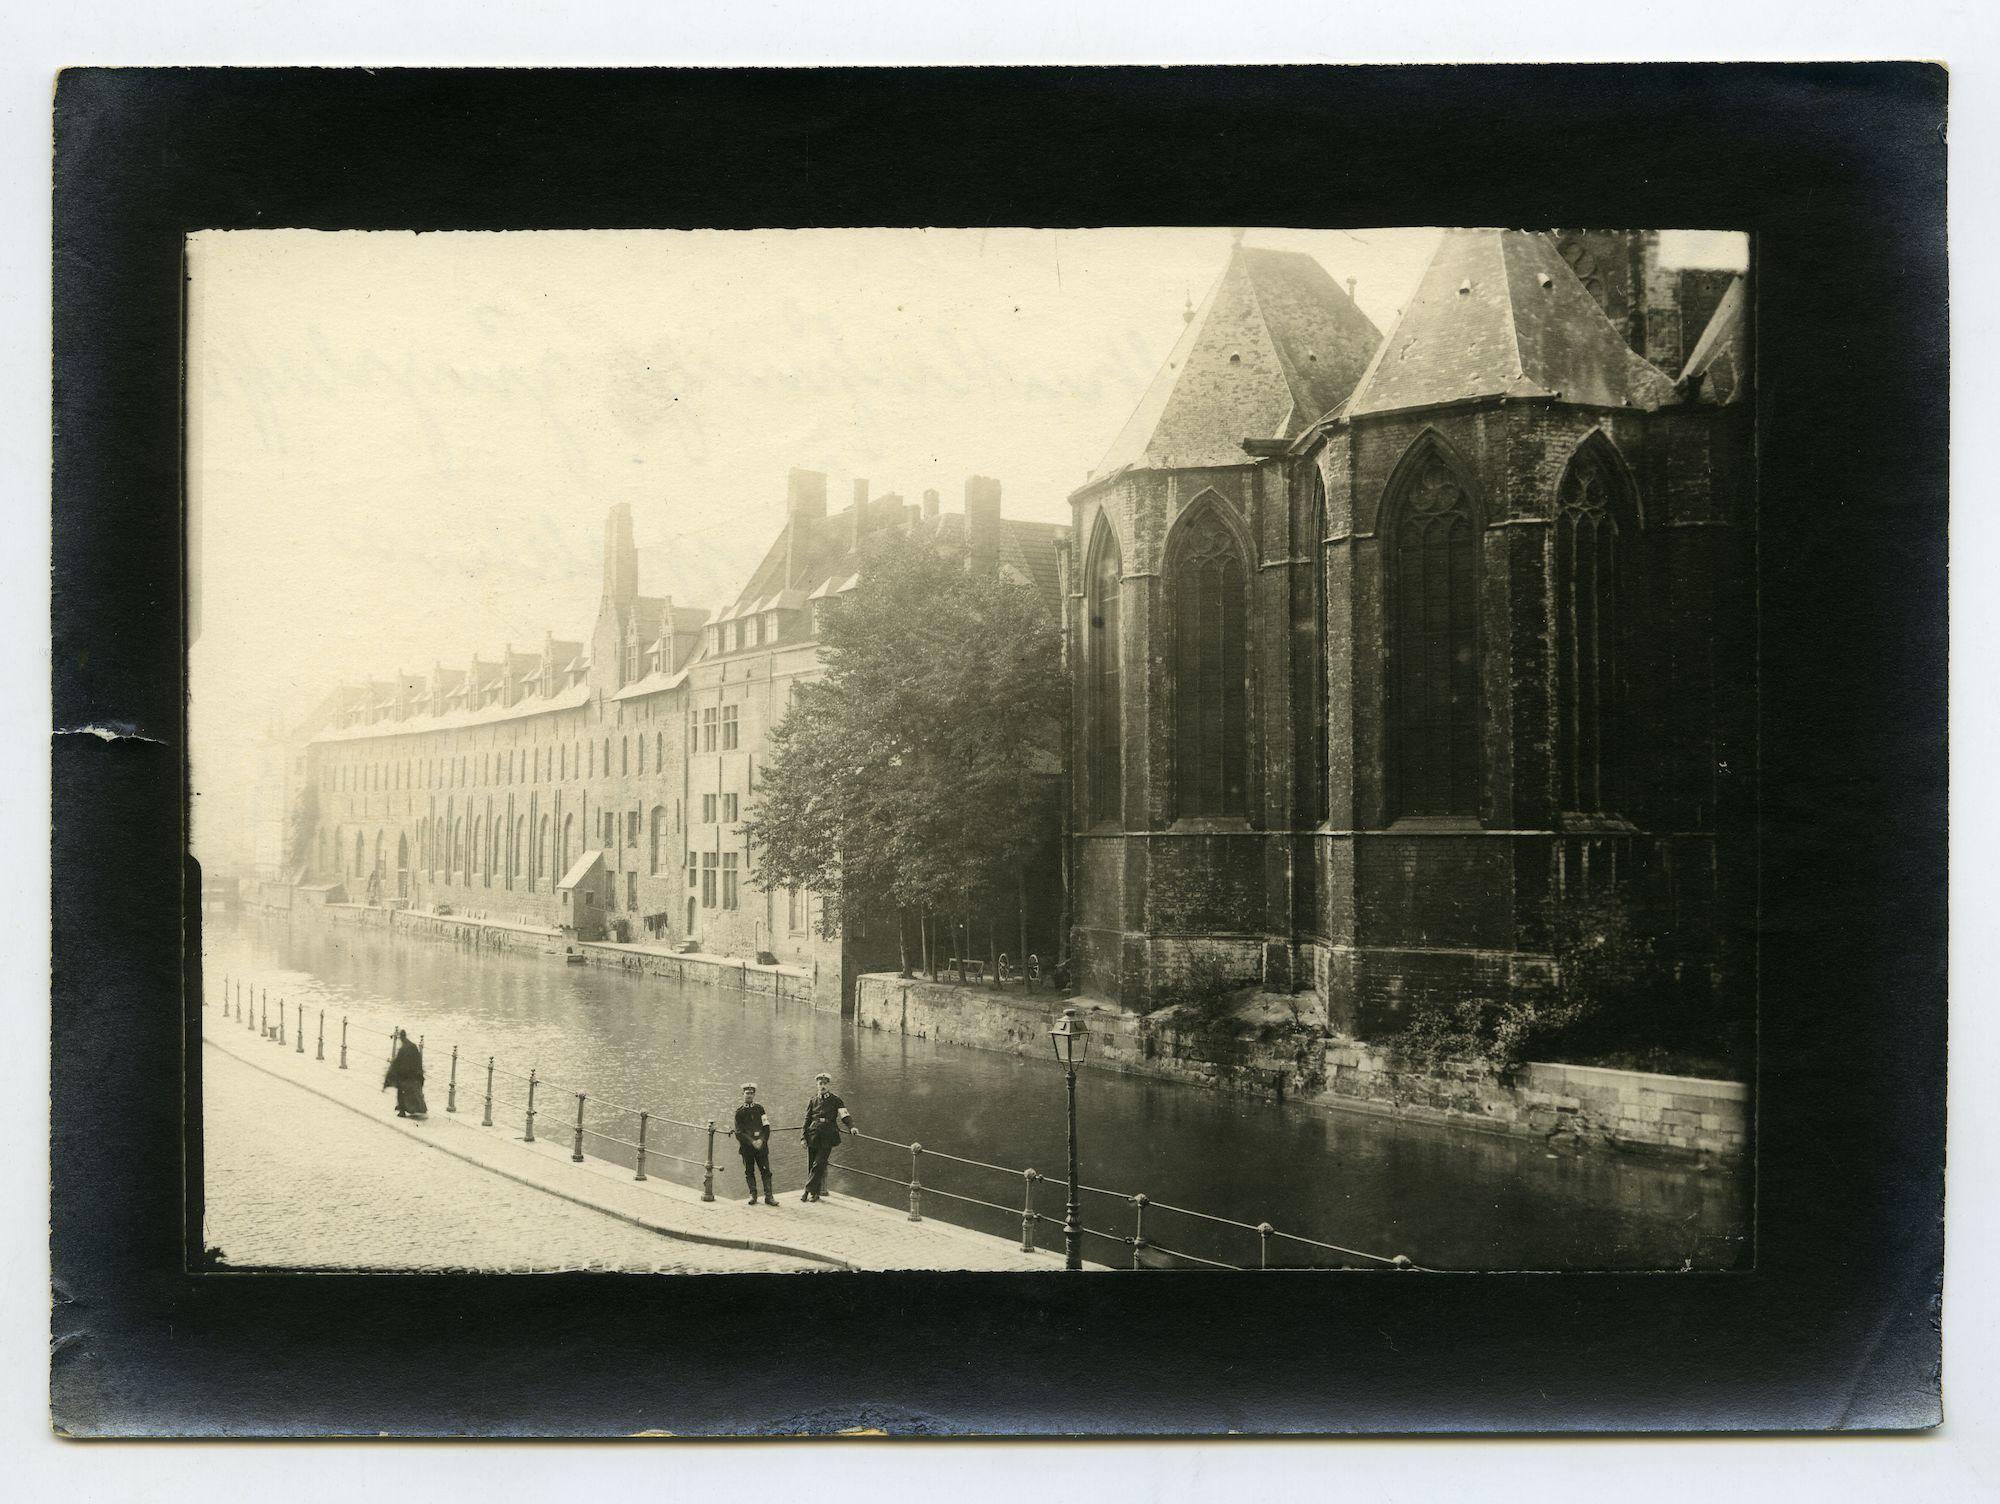 Gent: Predikherenlei: Sint-Michielskerk en het Pand, 1915-1916